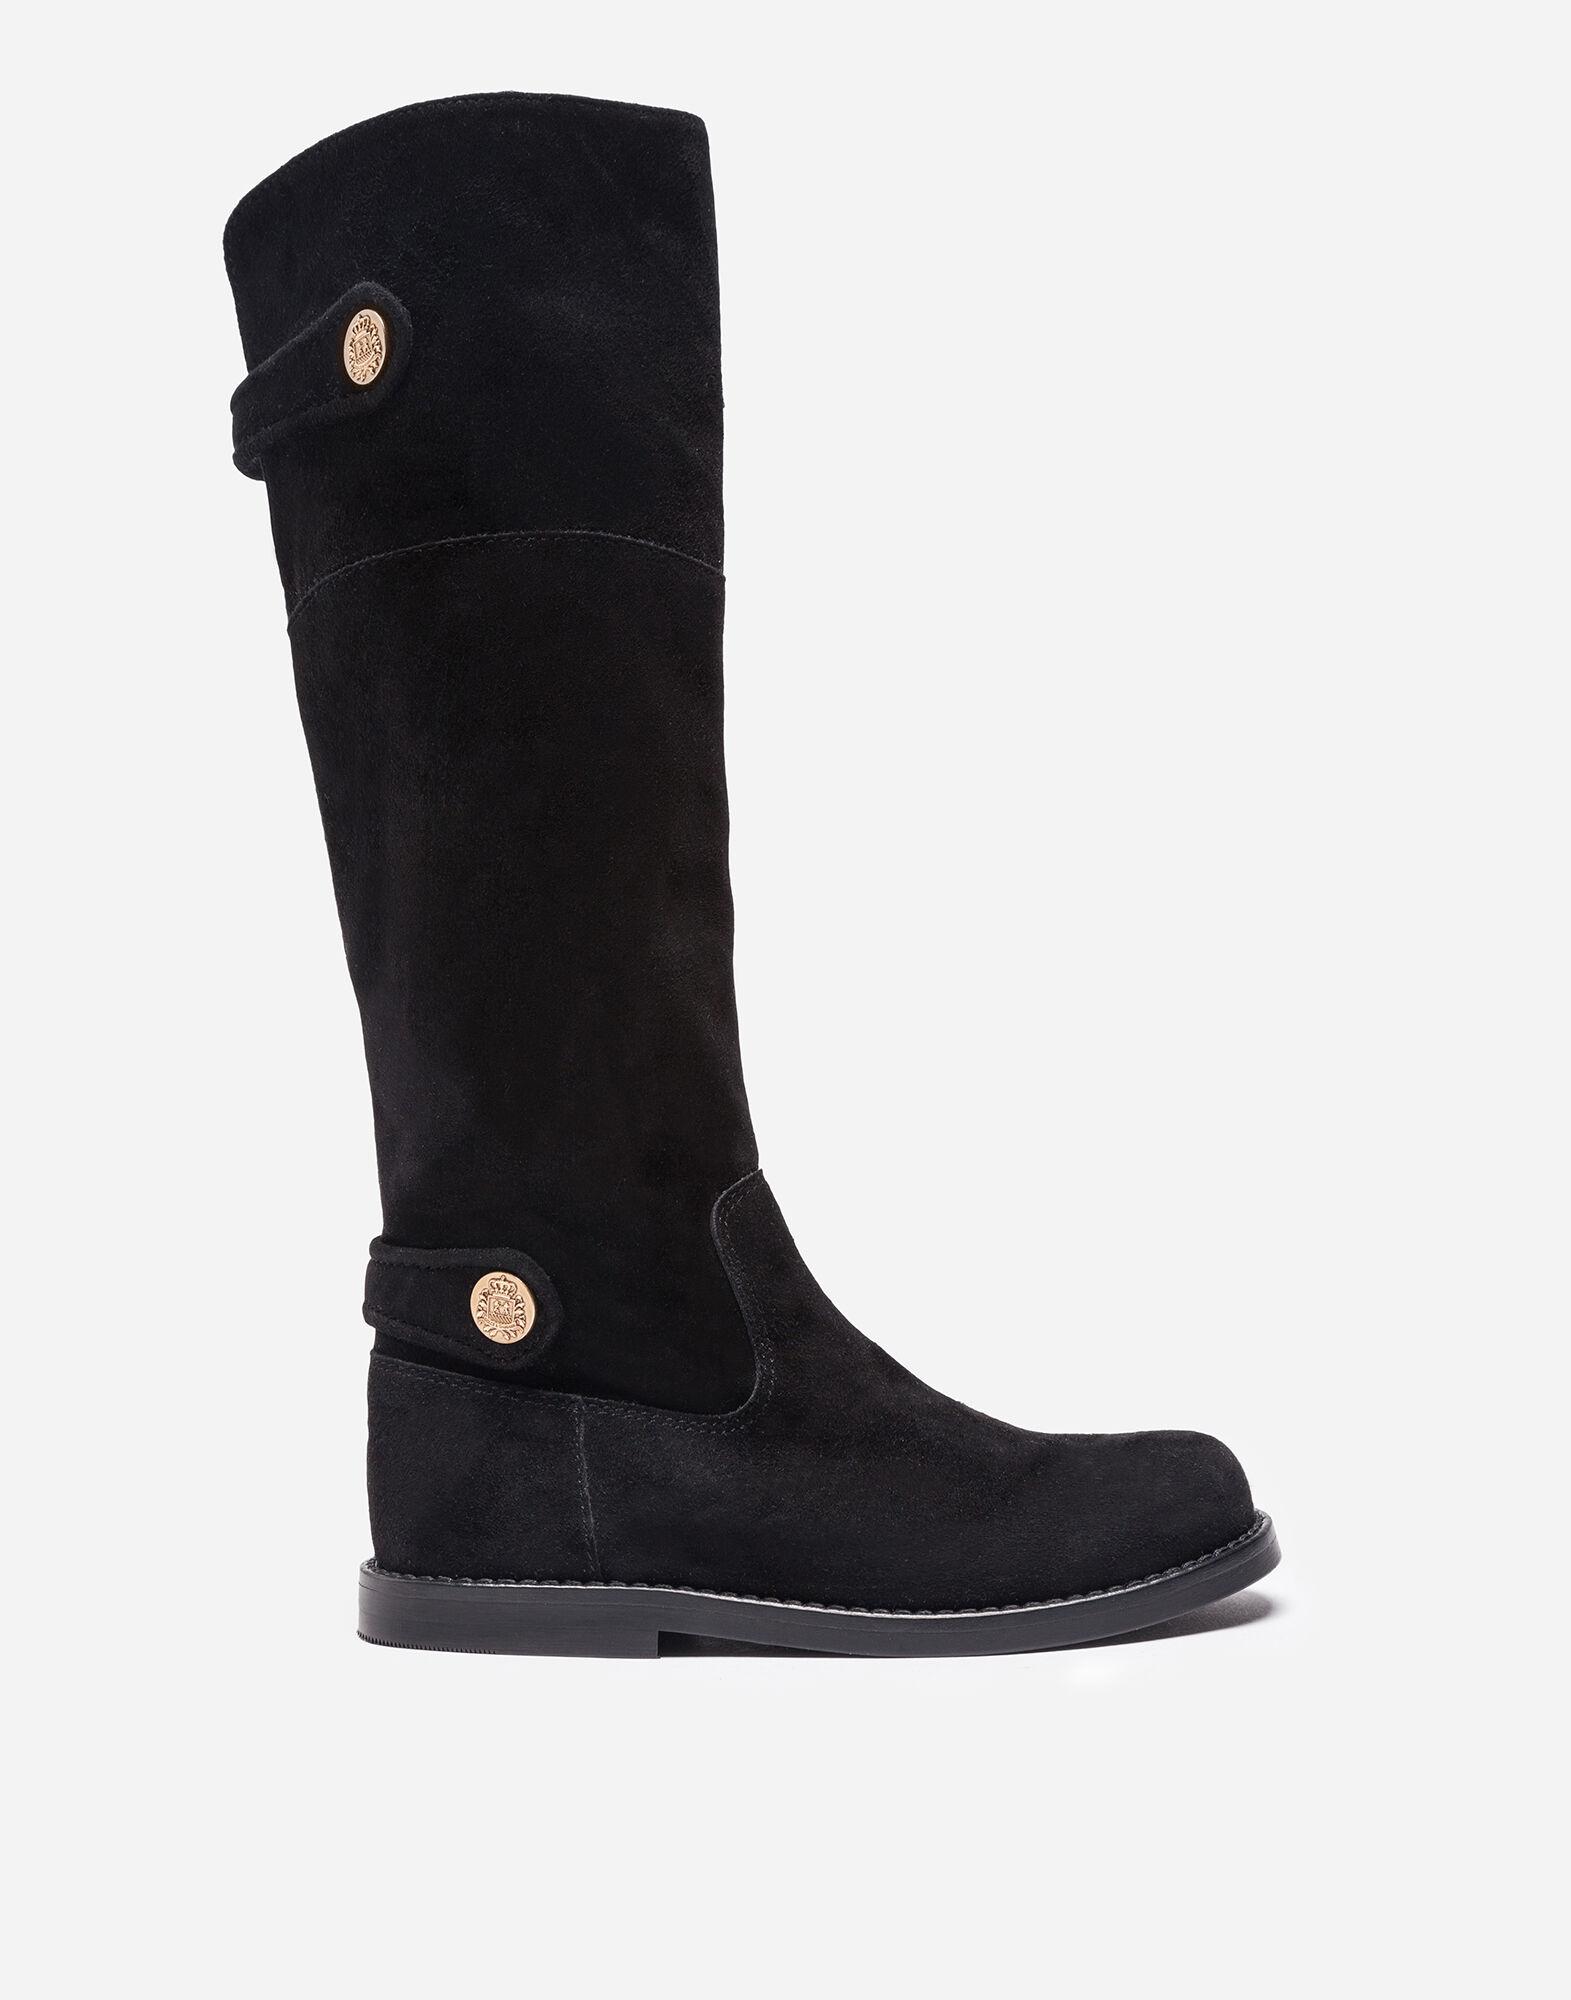 Dolce&Gabbana SUEDE BOOTS